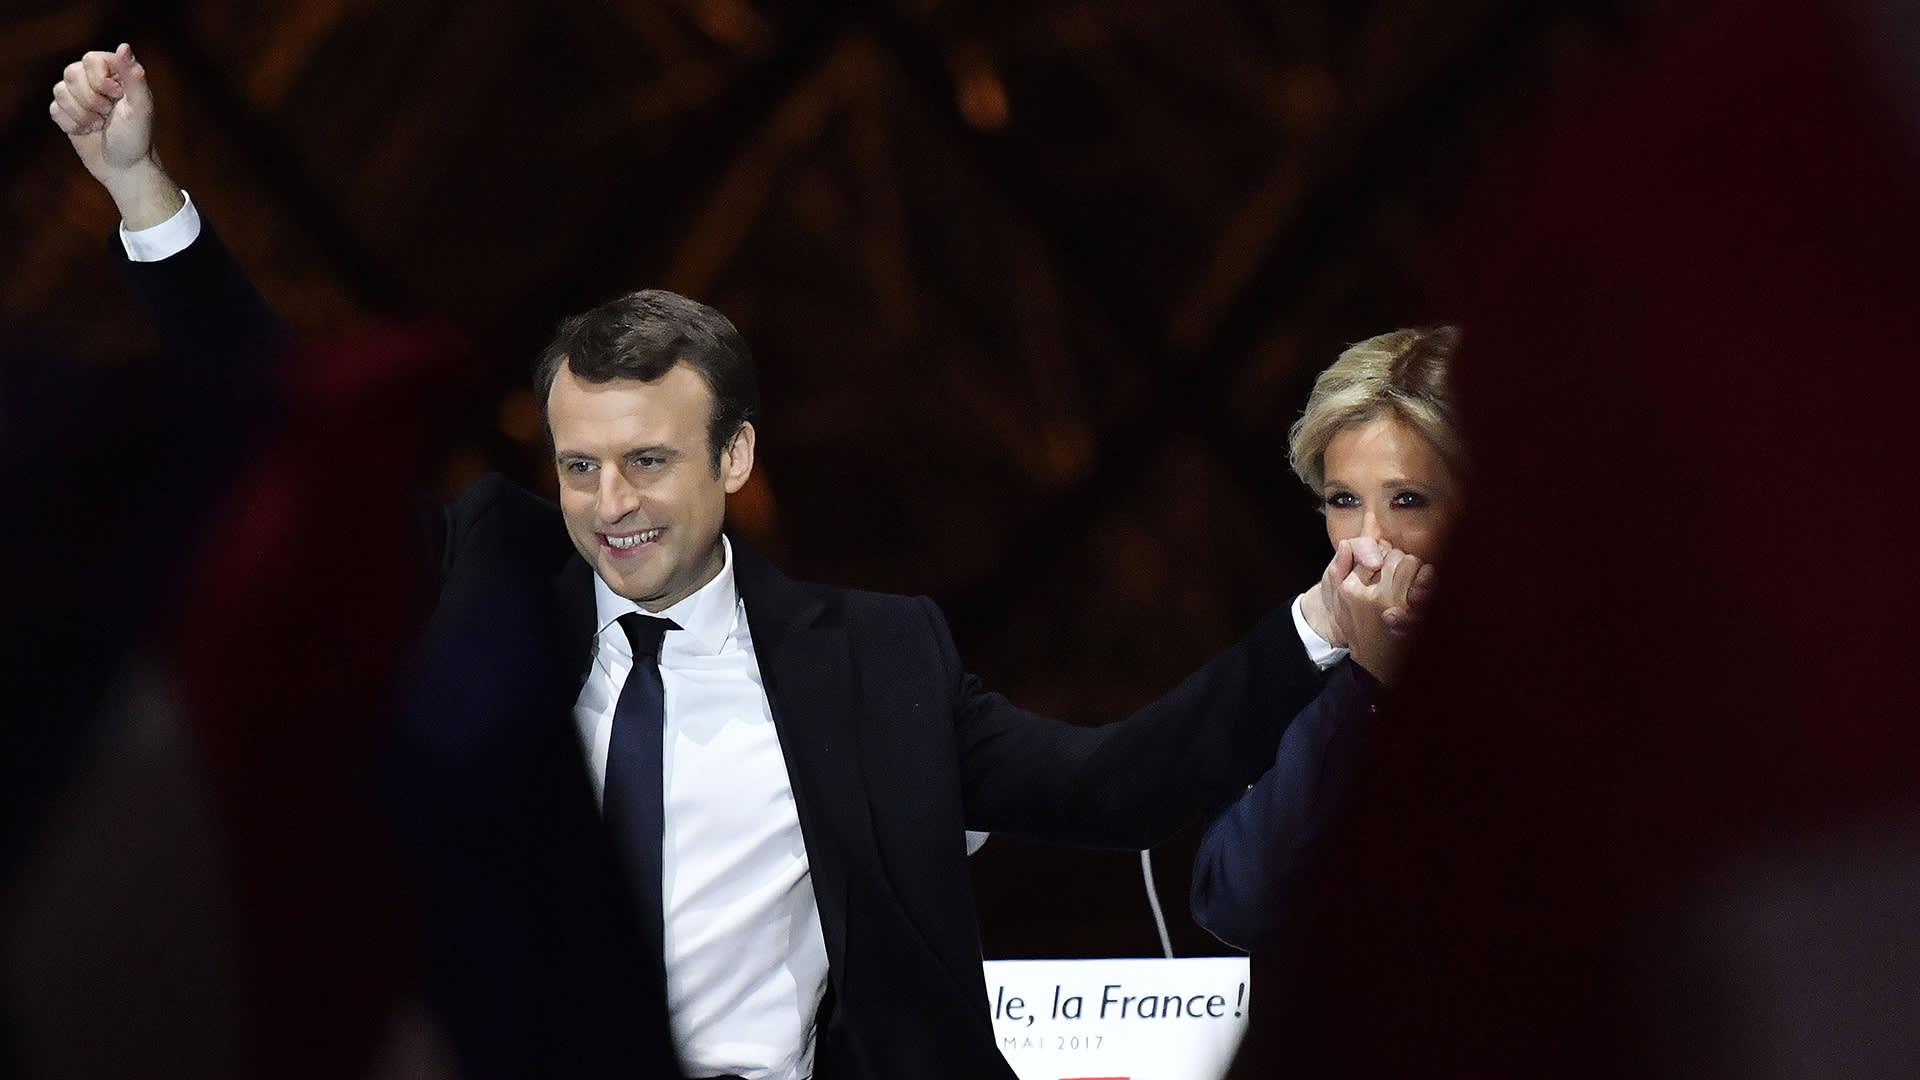 Ranskan presidentti Emmanuel Macron ja vaimonsa Brigitte Trogneux.